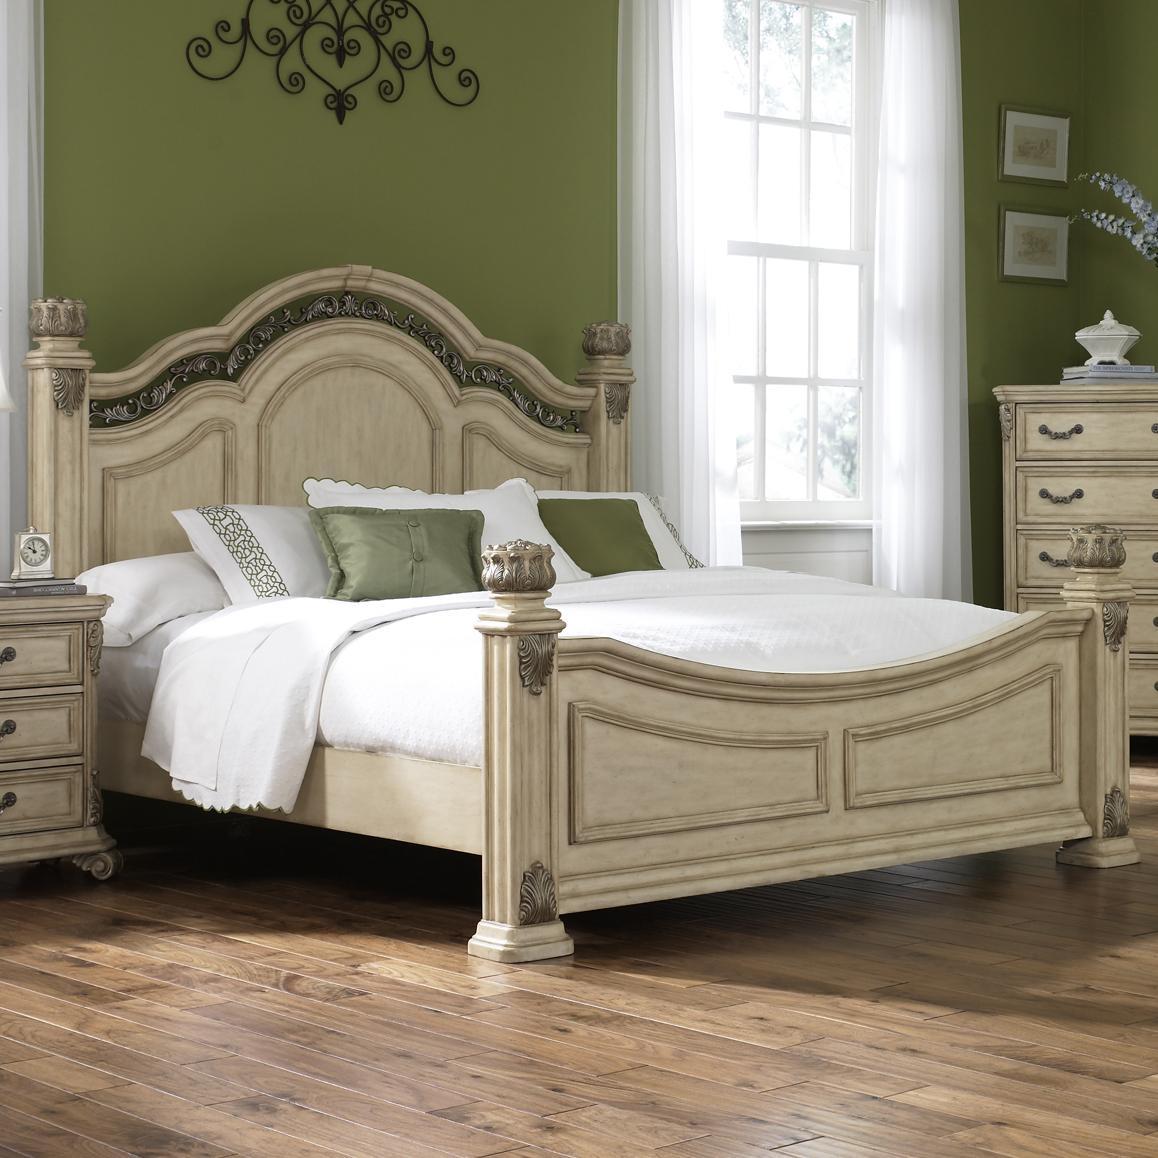 Liberty Furniture Messina Estates II King Poster Bed - Item Number: 837-BR03+04+73